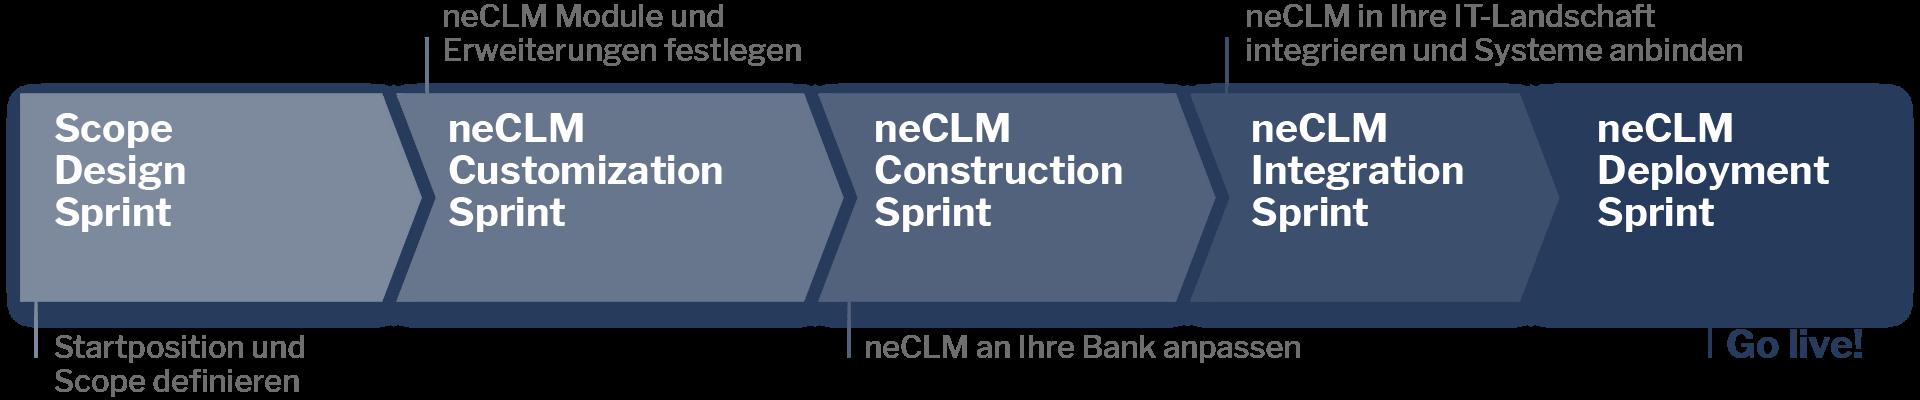 neCLM Realization Sprint